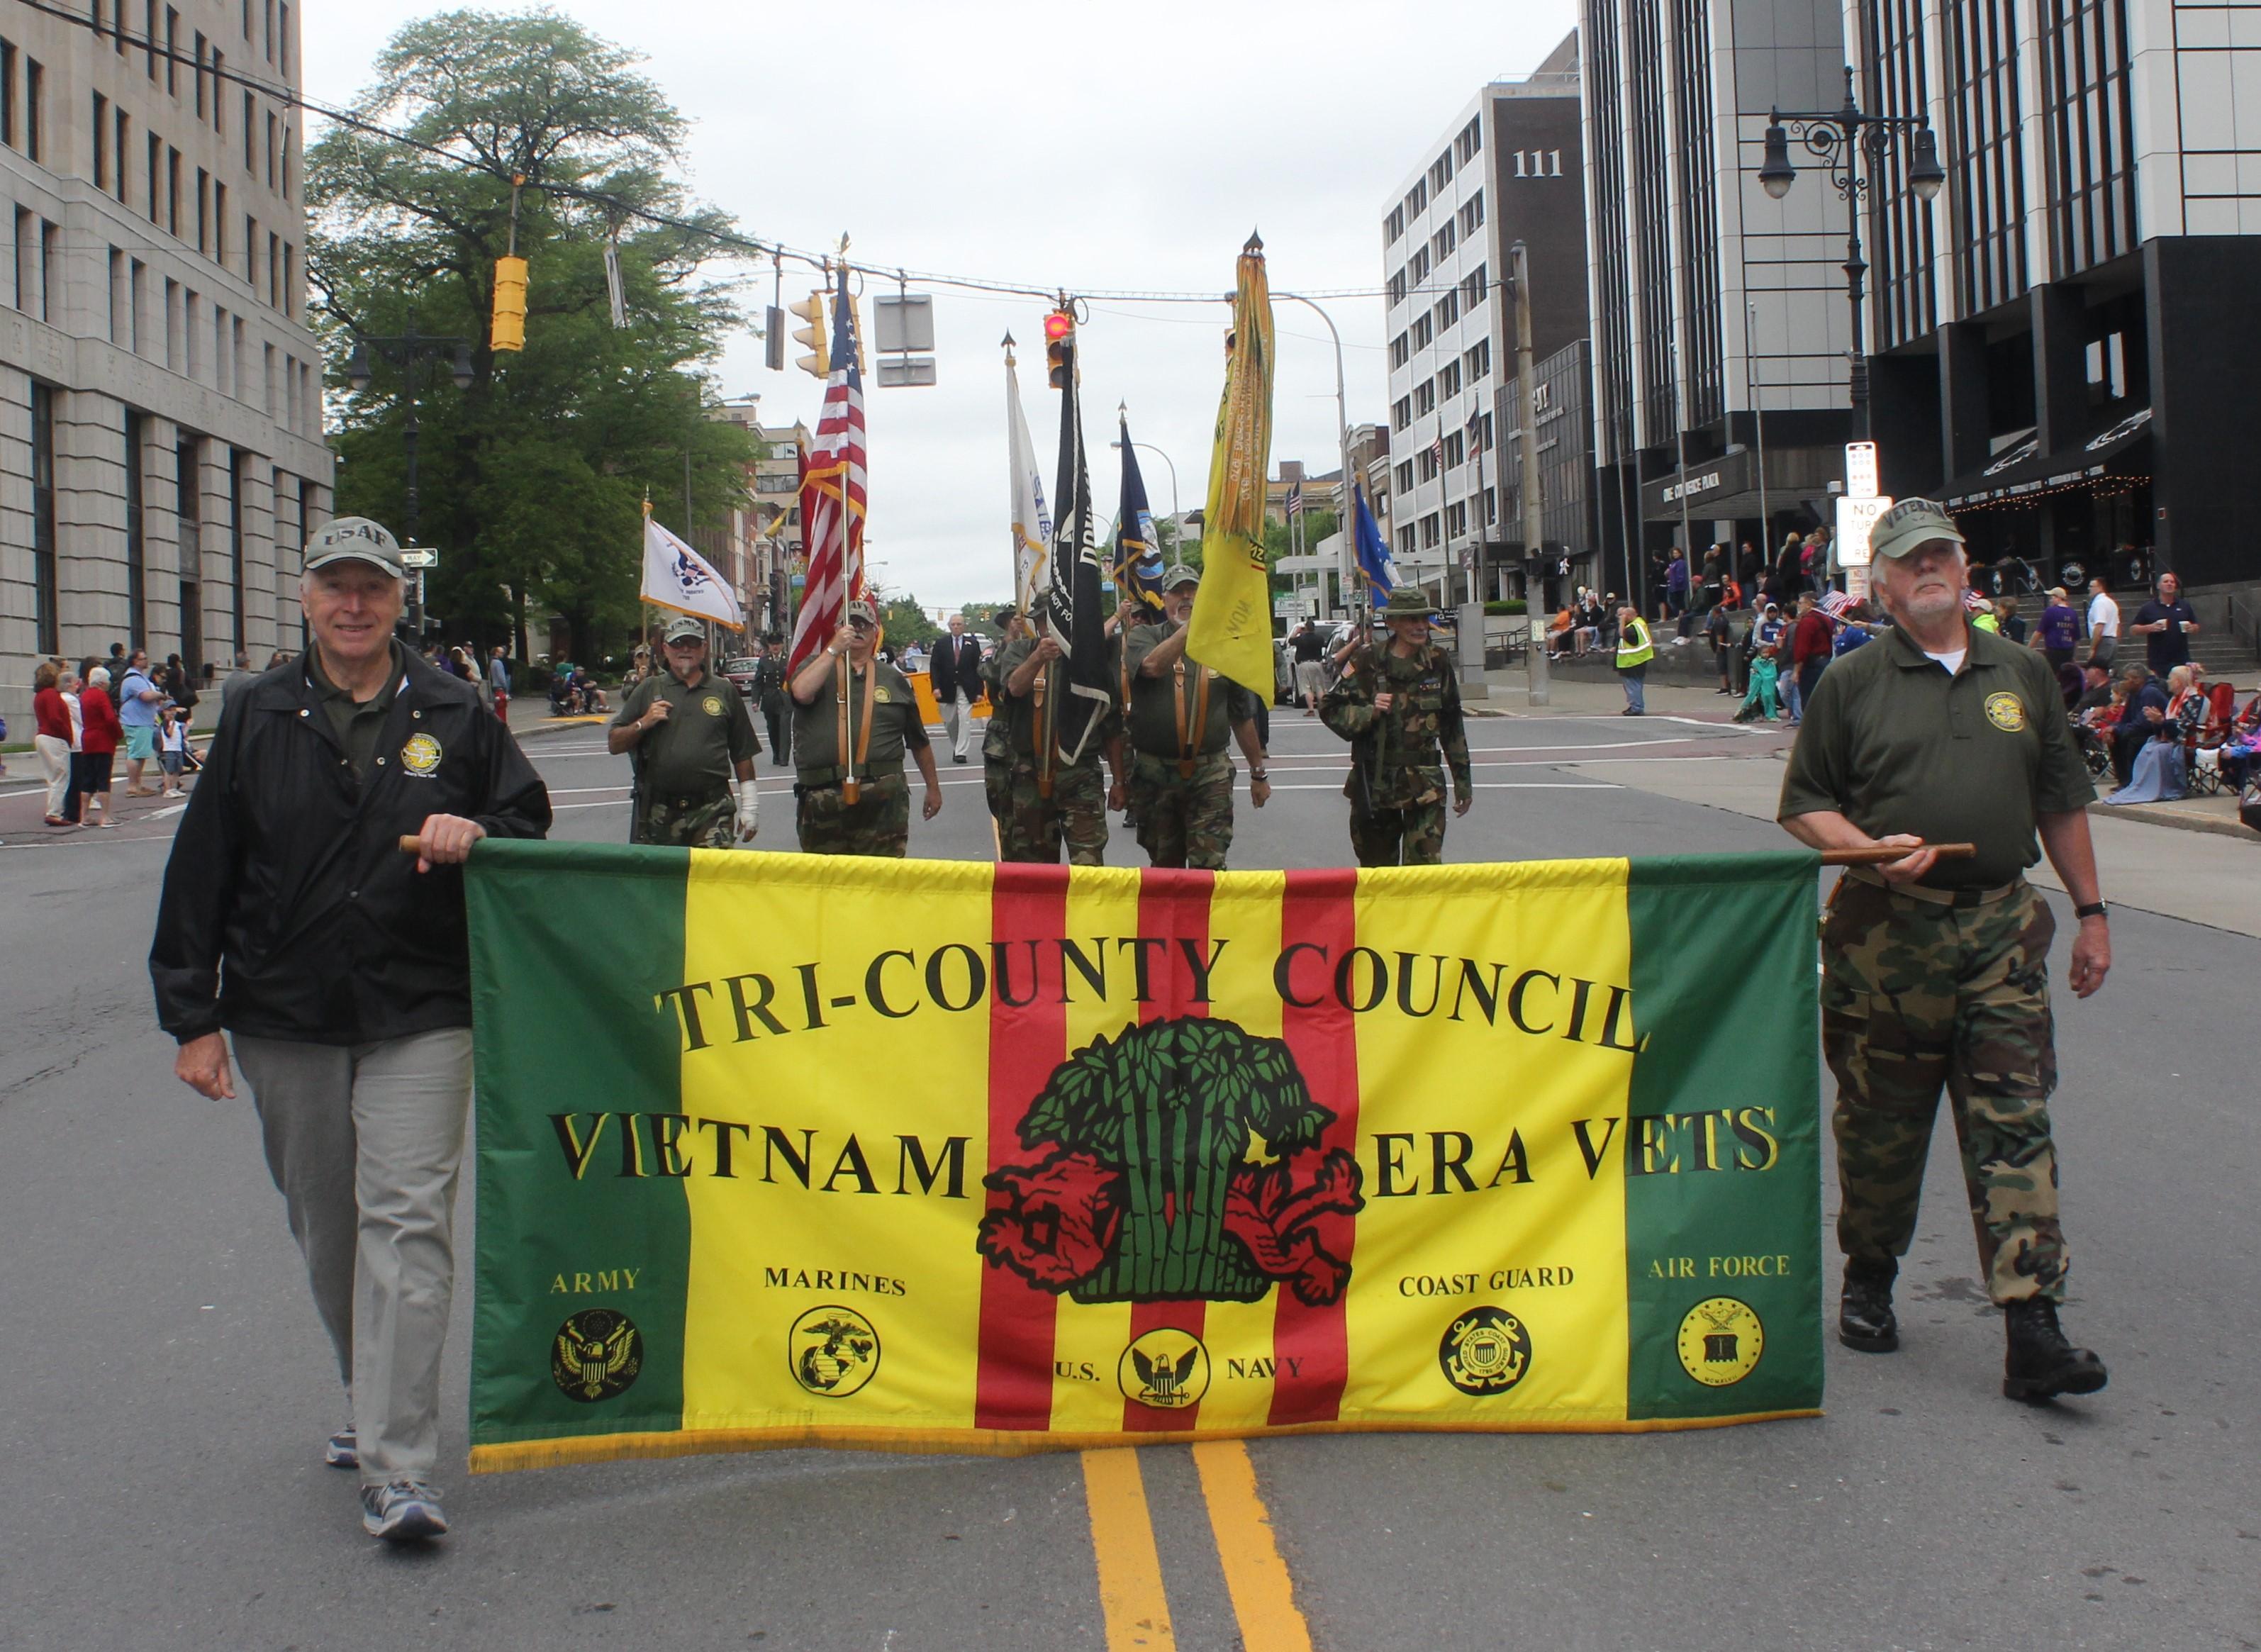 Tri-County Council Vietnam Era Veterans Parade Holding Banner